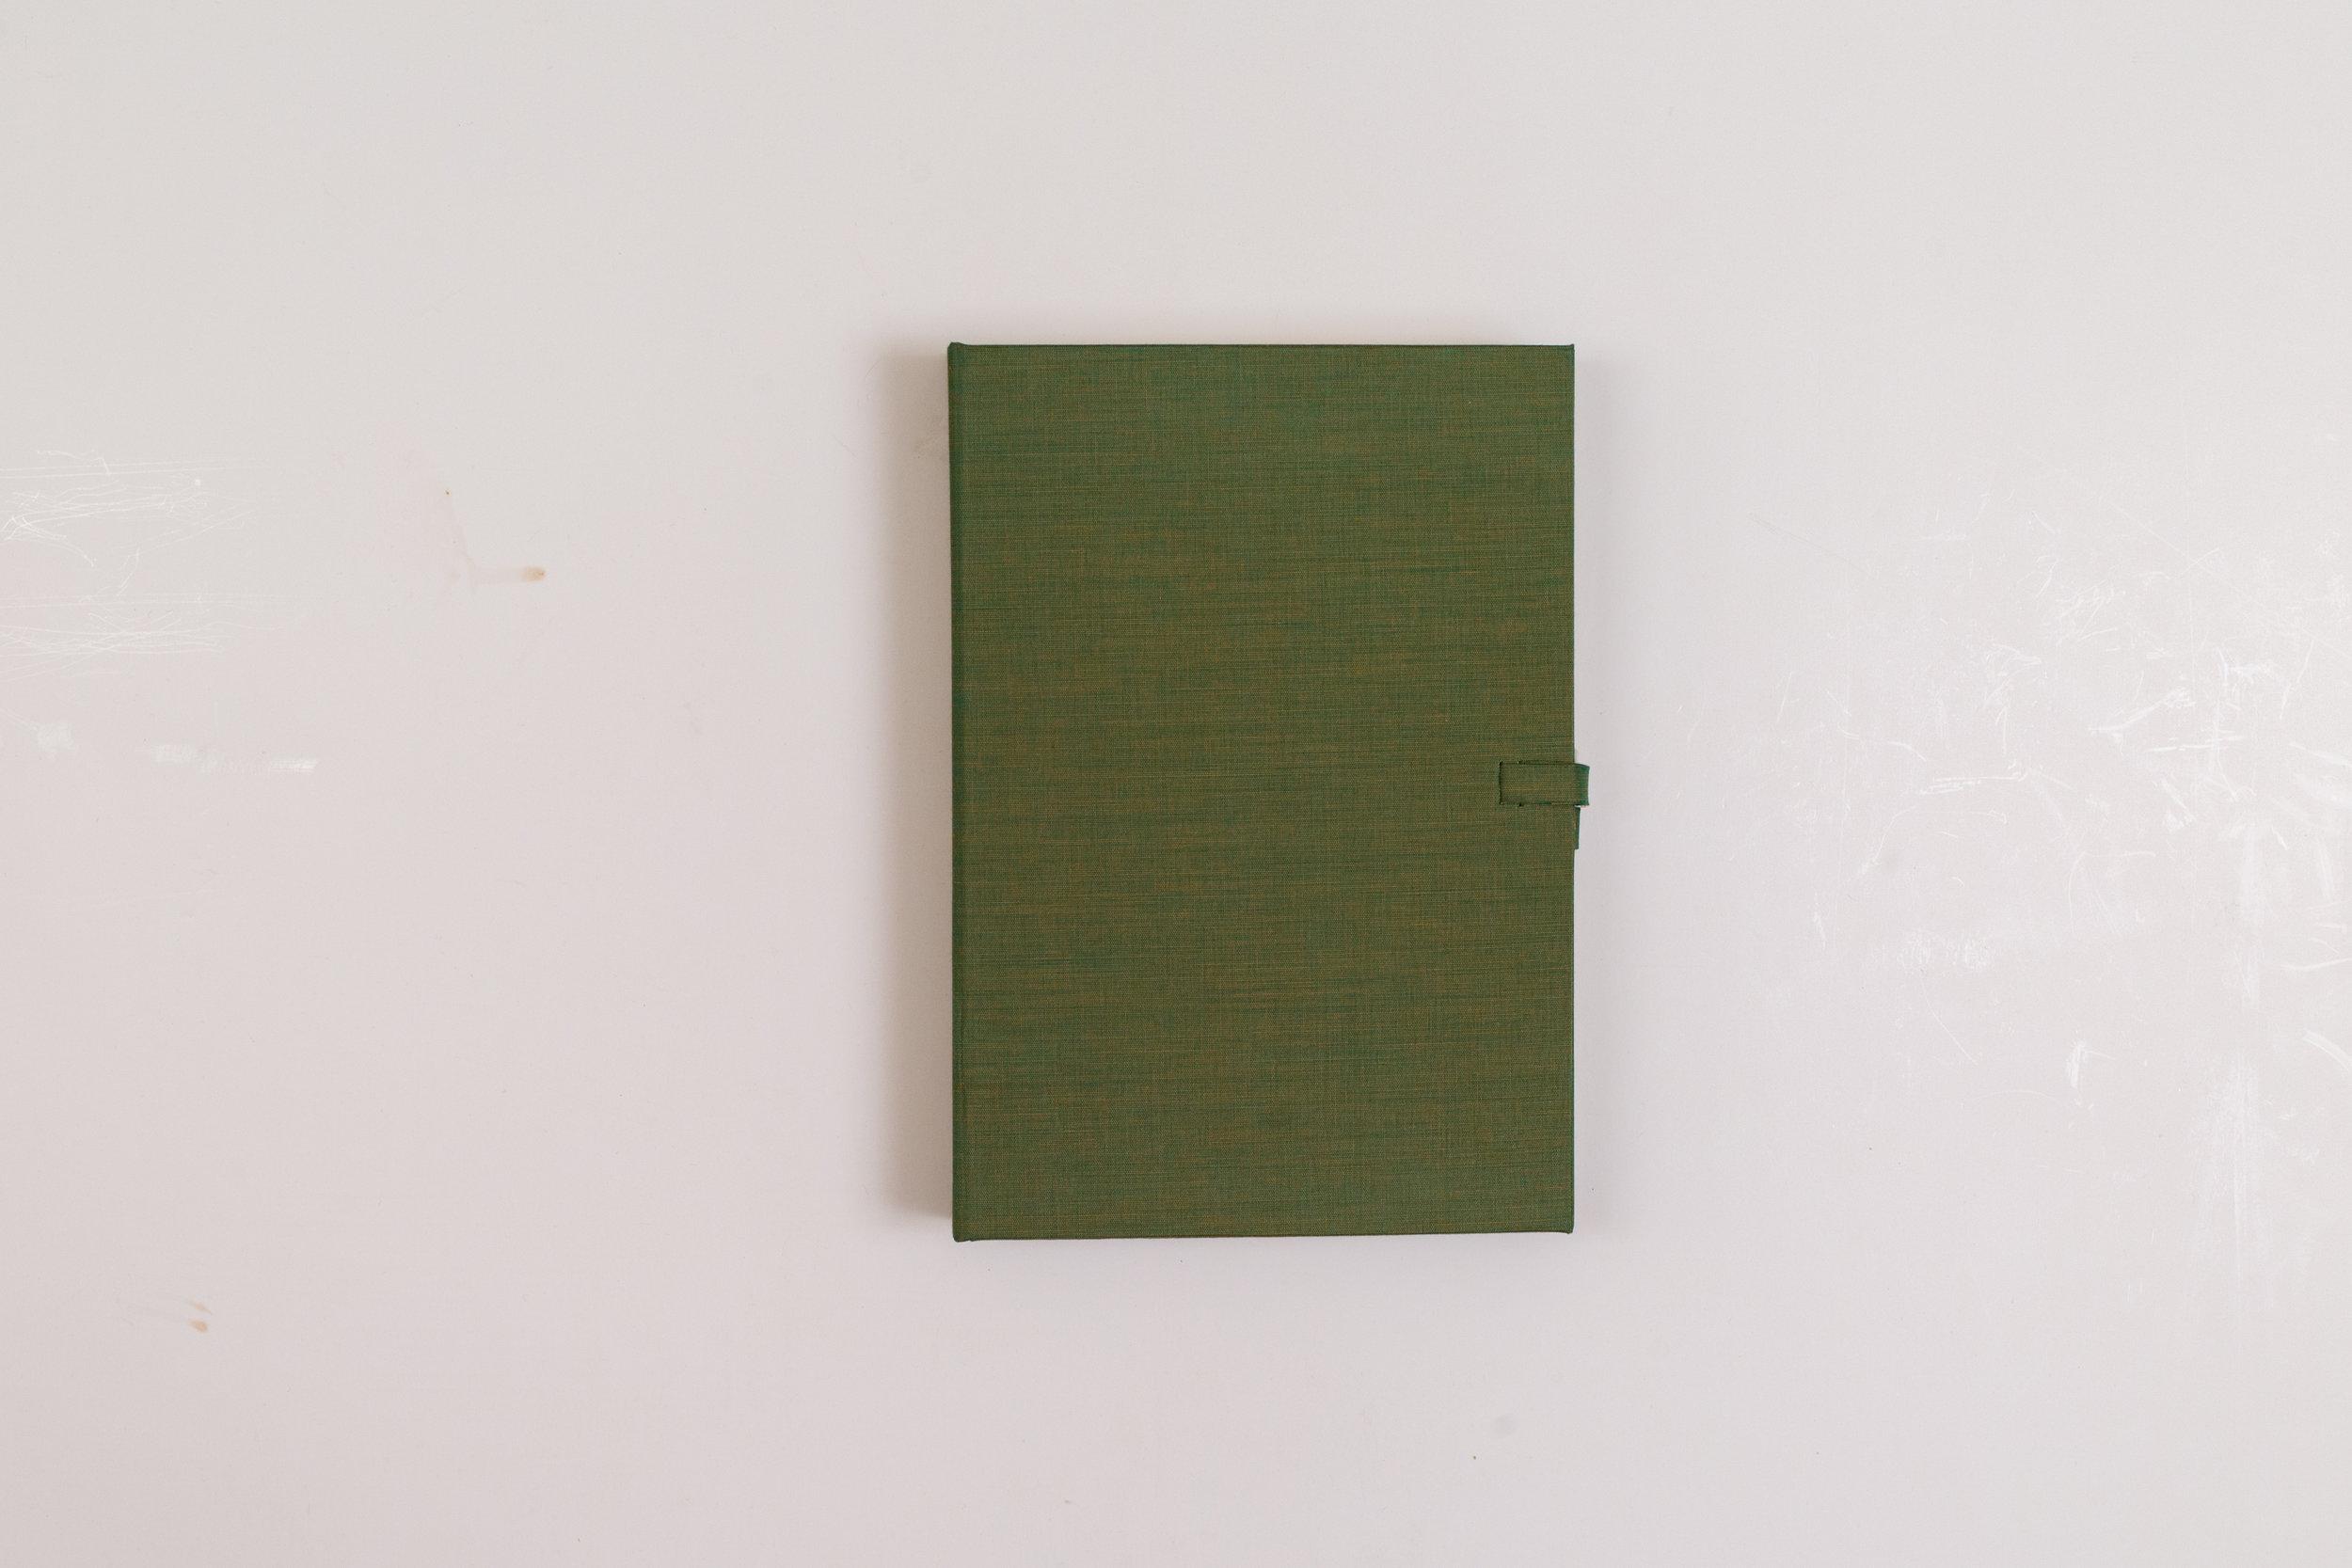 Japanese Handmade book